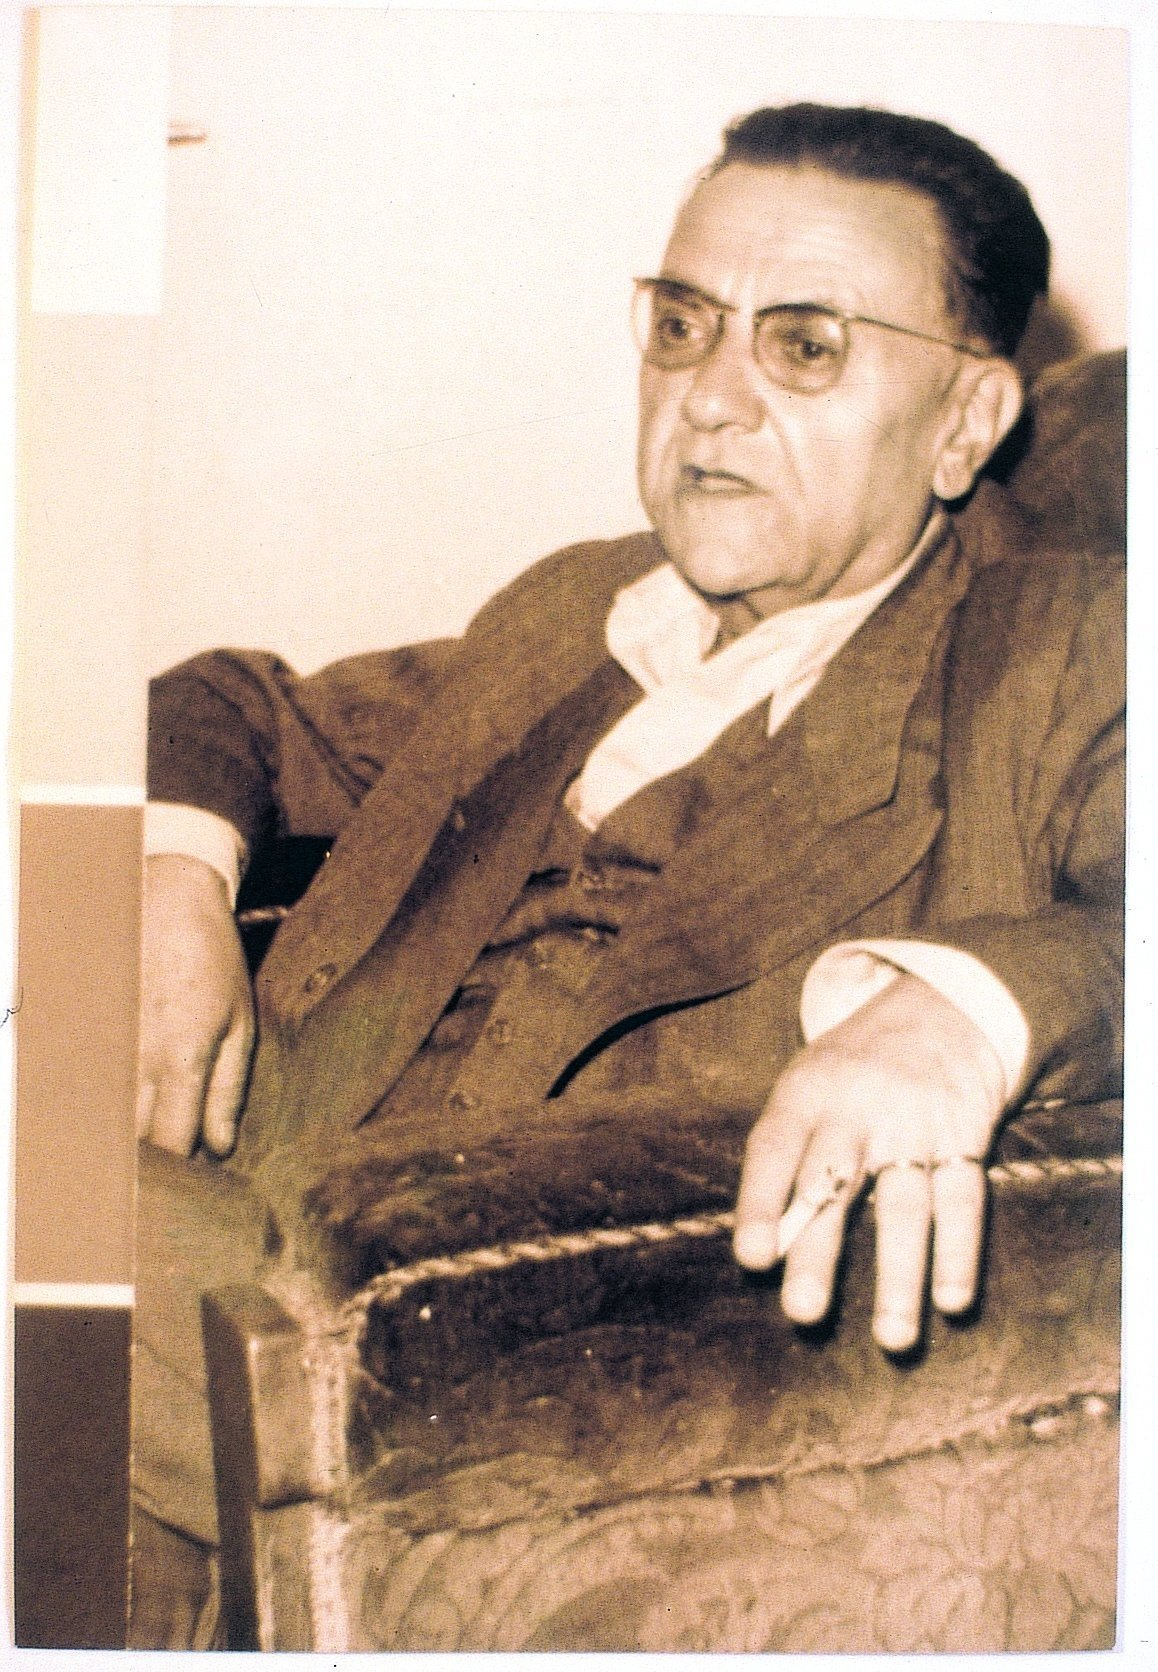 Nurullah Ataç represented subjective literary criticism, which Hüseyin Cöntürk opposed.